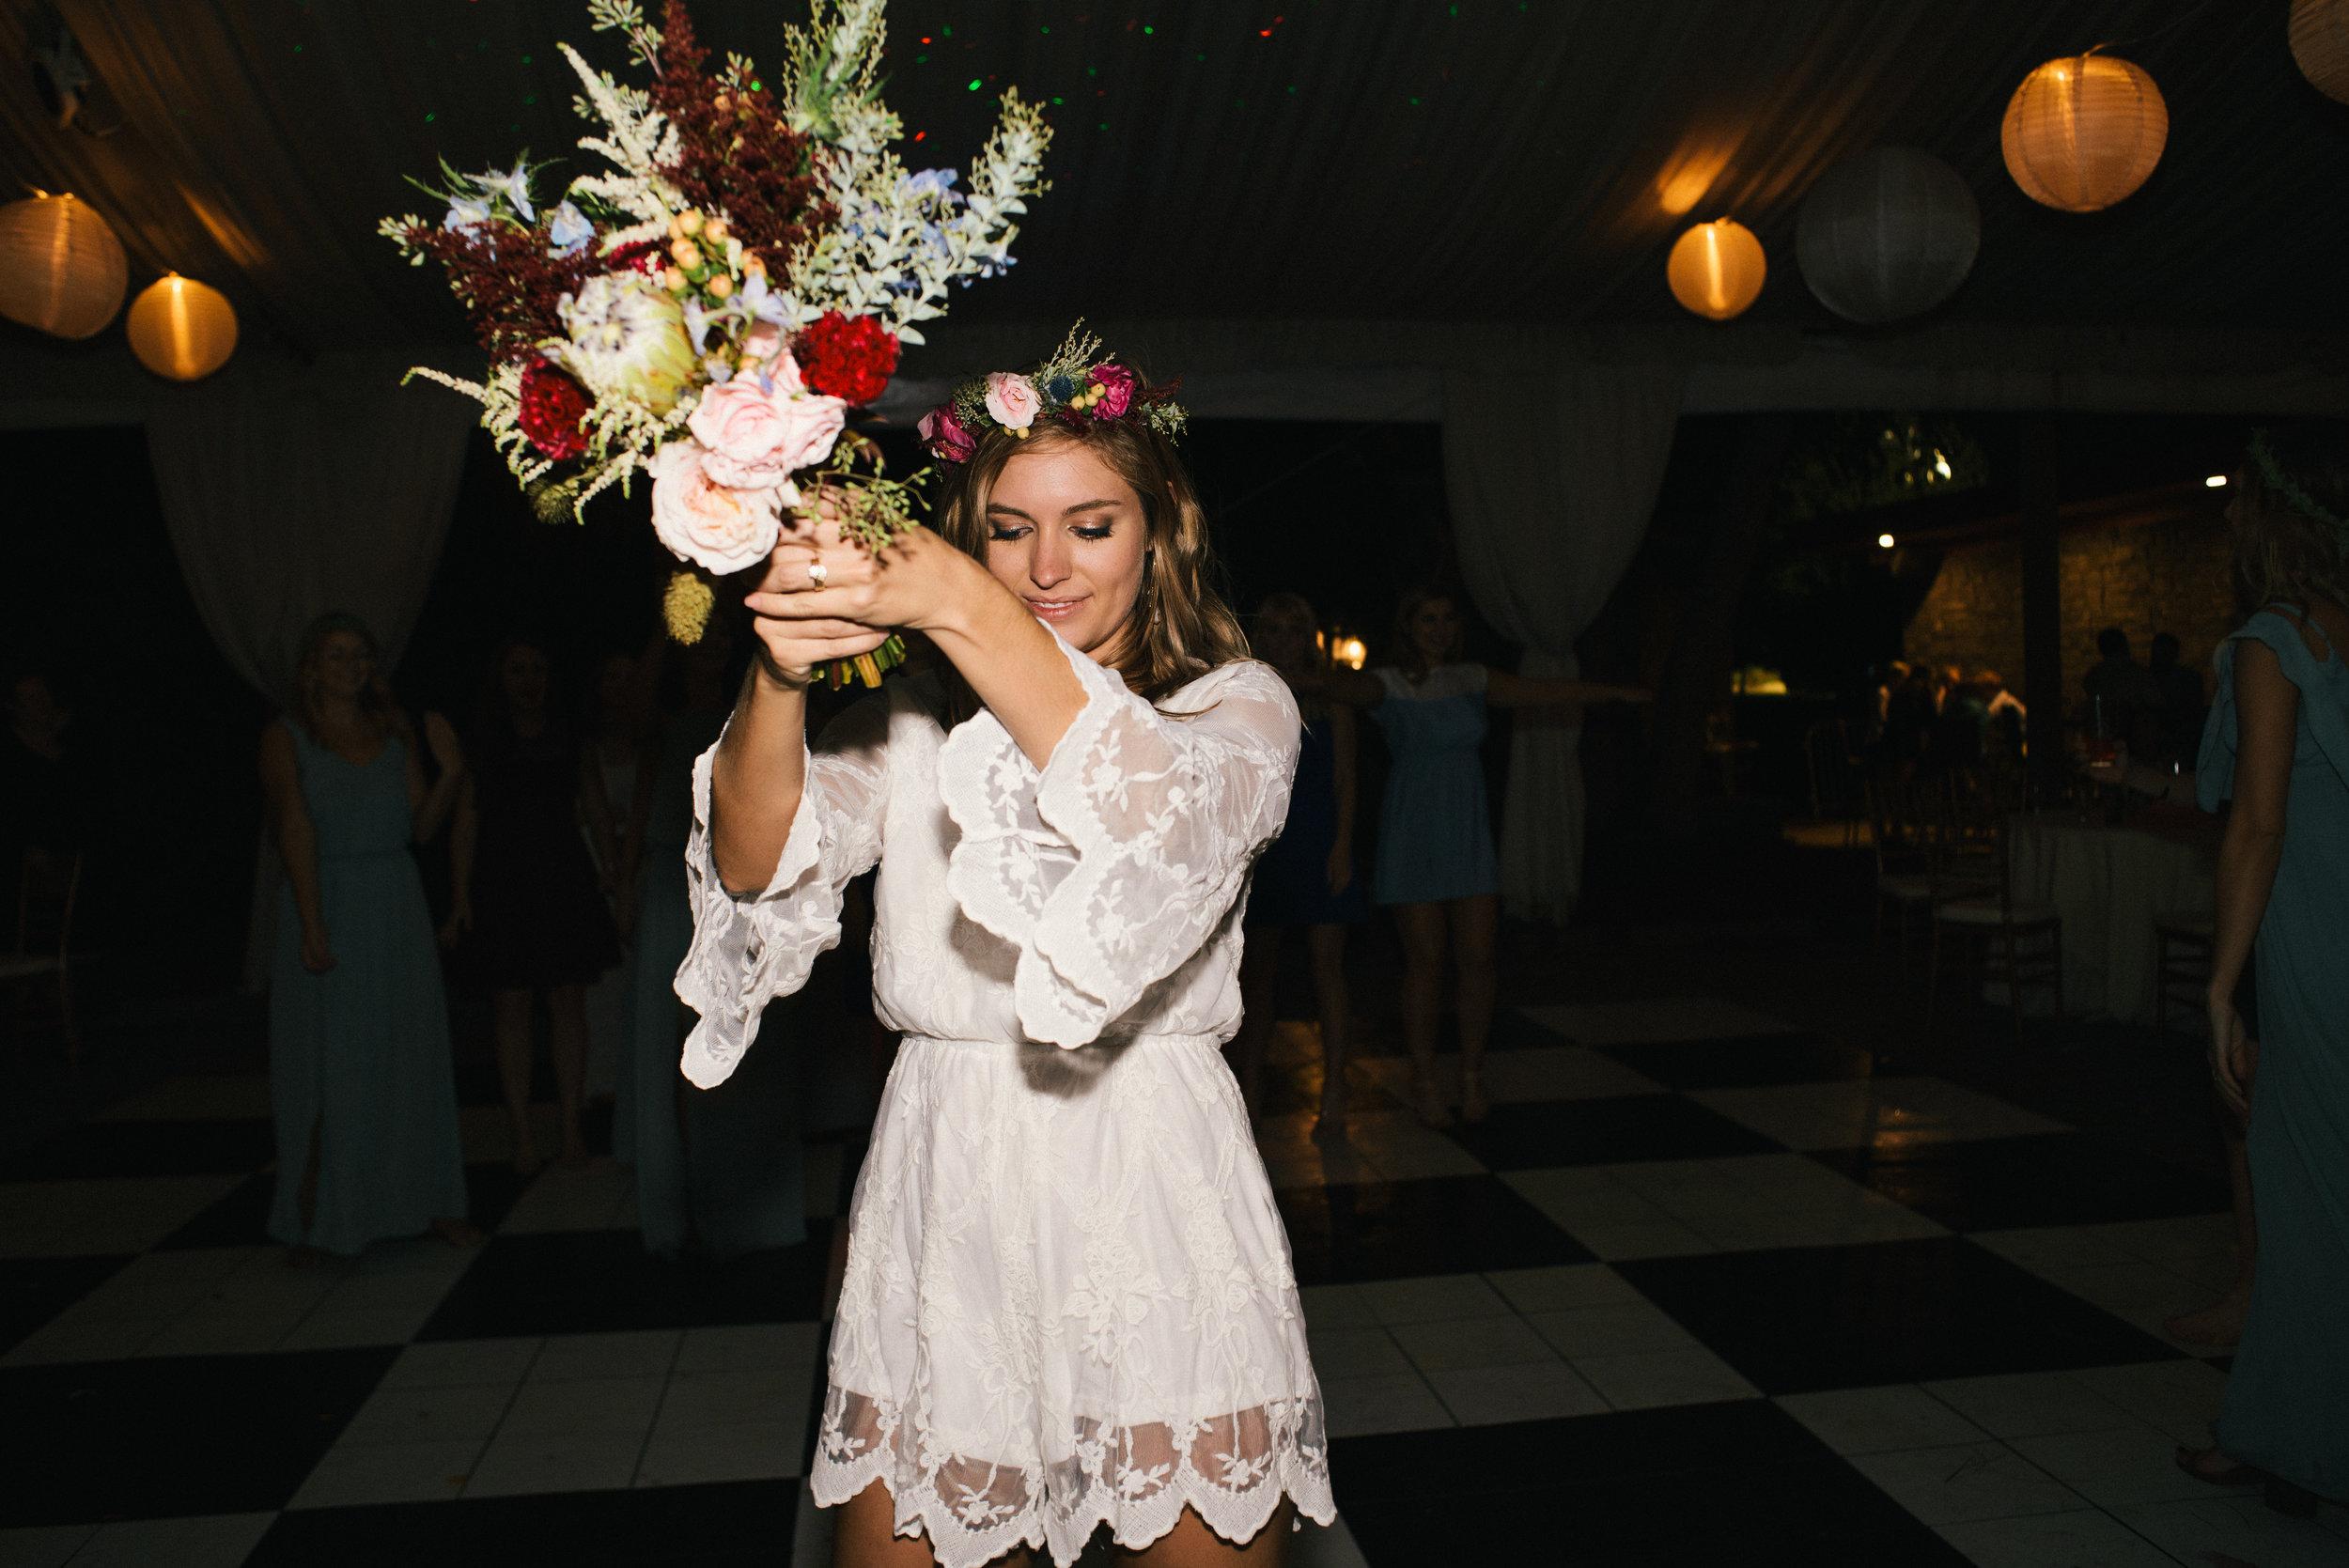 kristin-and-peter-atlanta-georgia-wedding-october-8th-2016 (966 of 1068).jpg